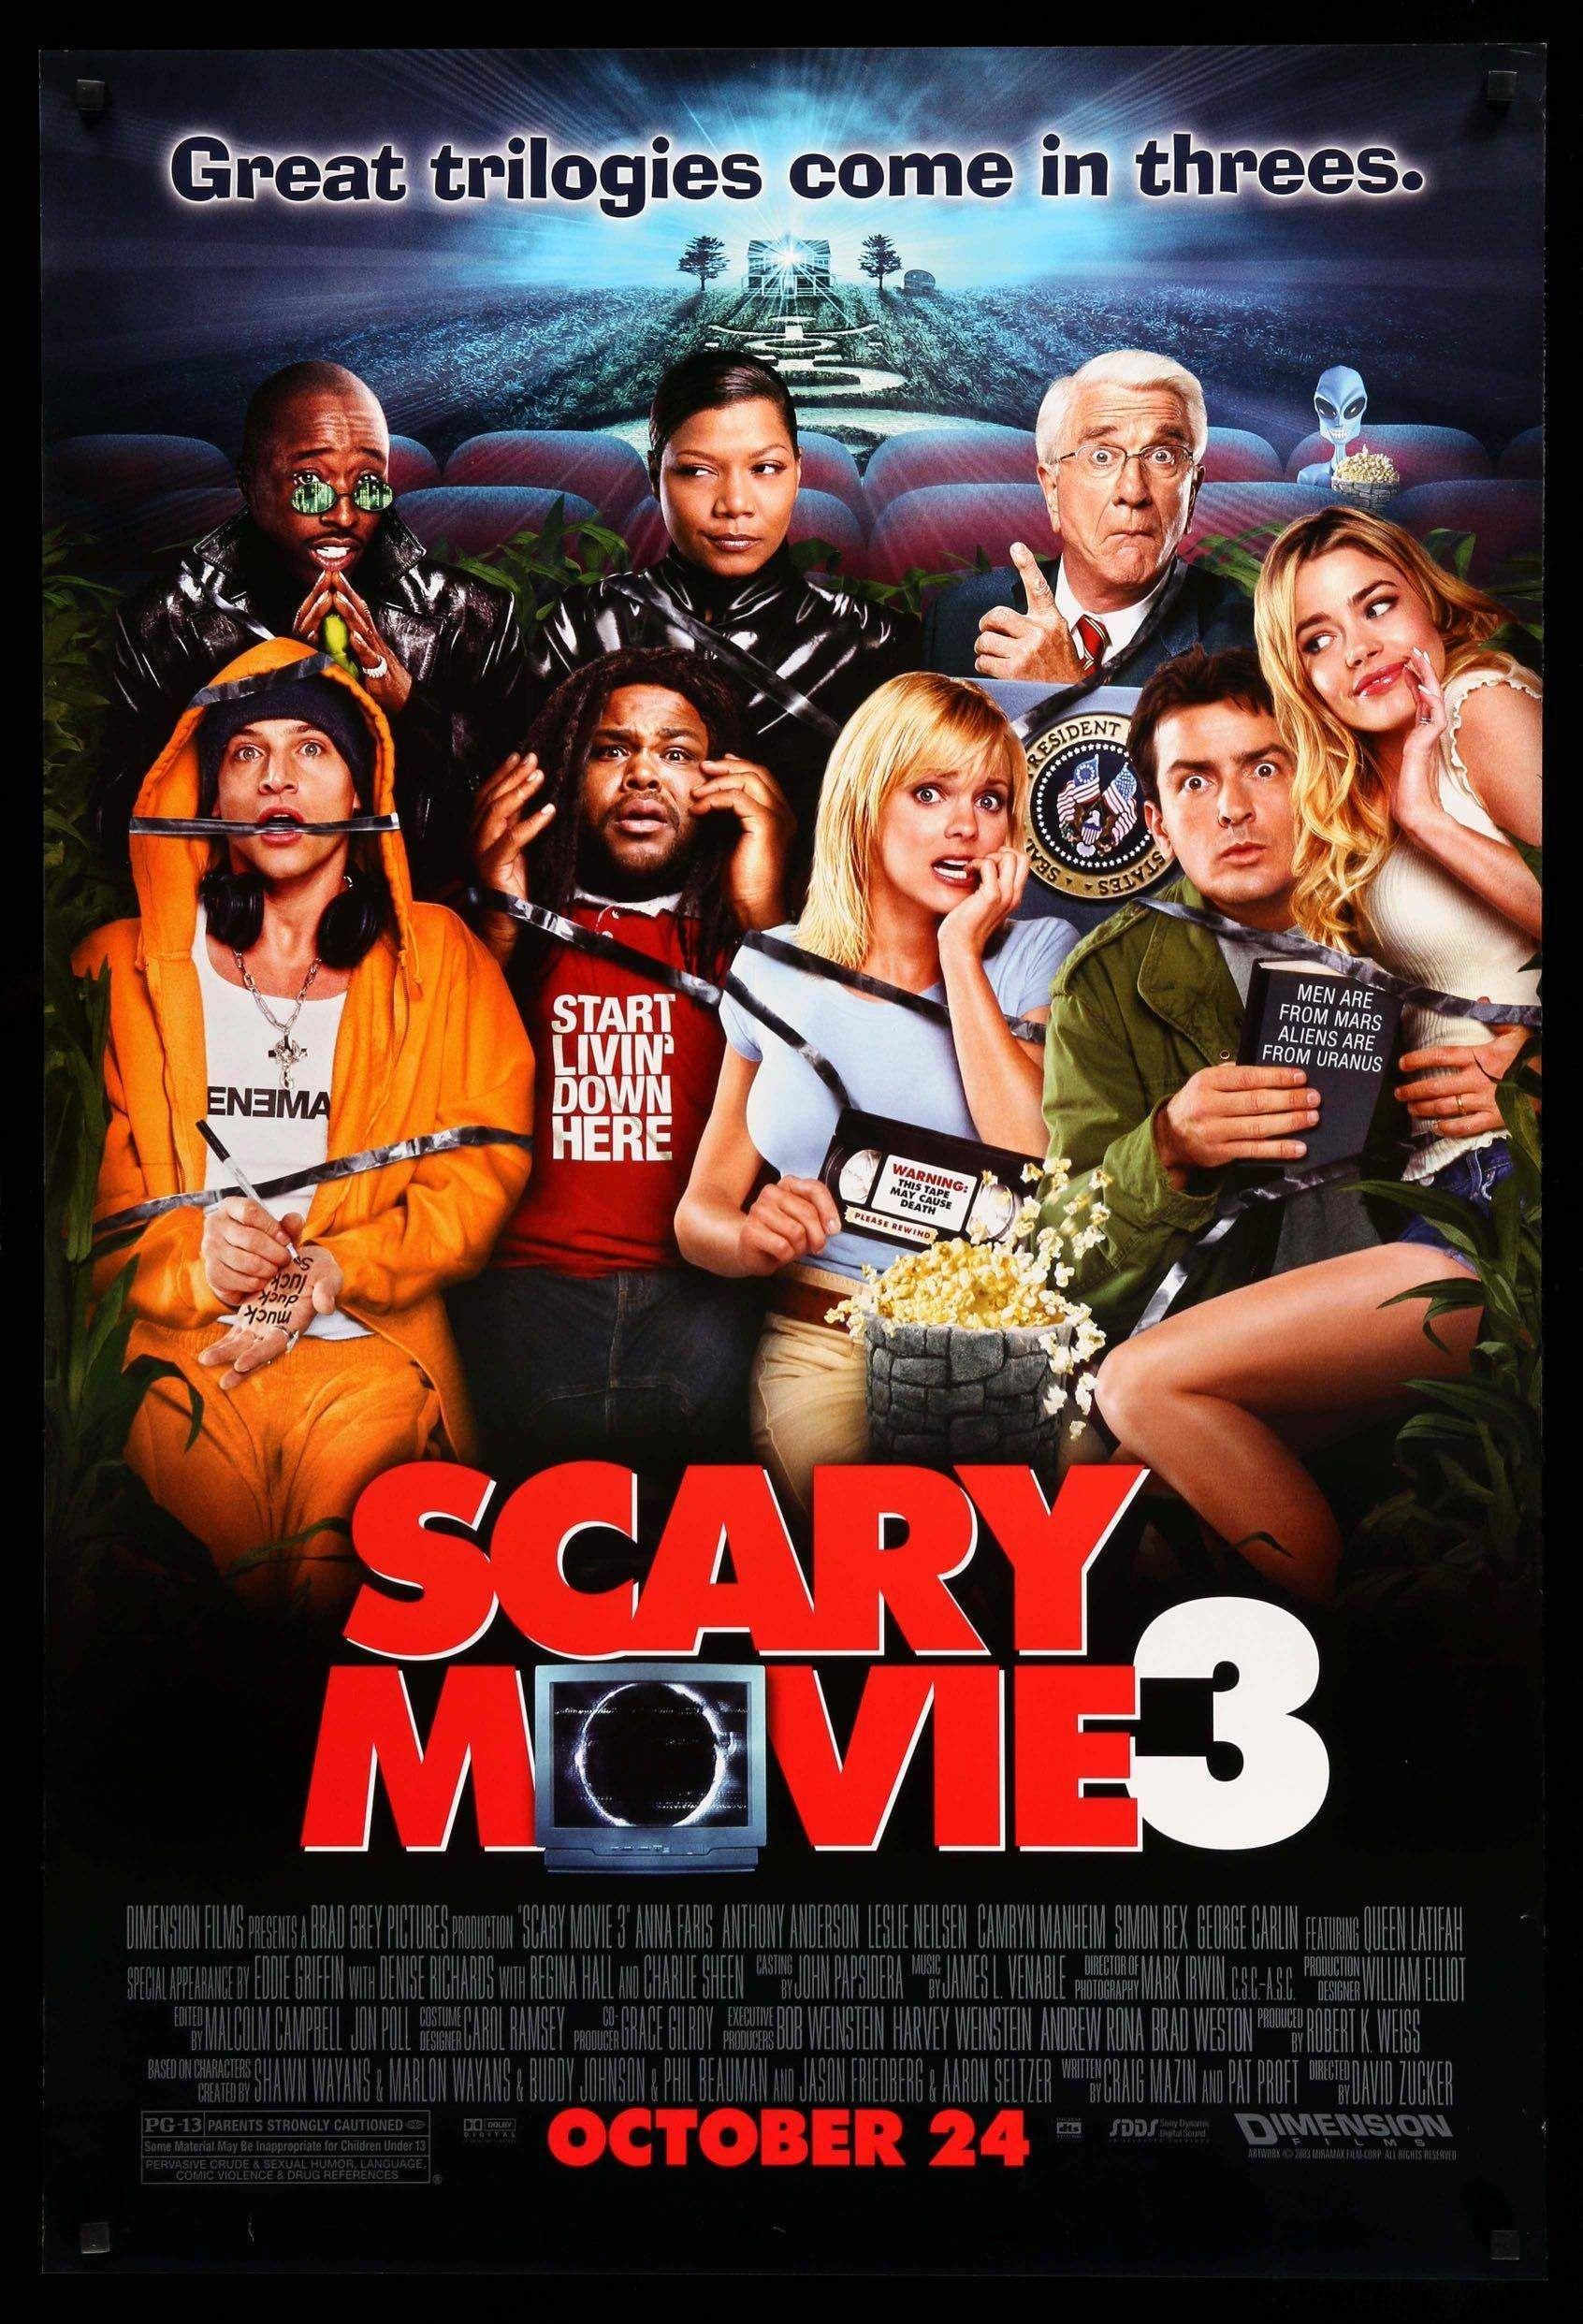 Scary Movie 3 2003 In 2020 Scary Movie 3 Scary Movies Scary Movie 2